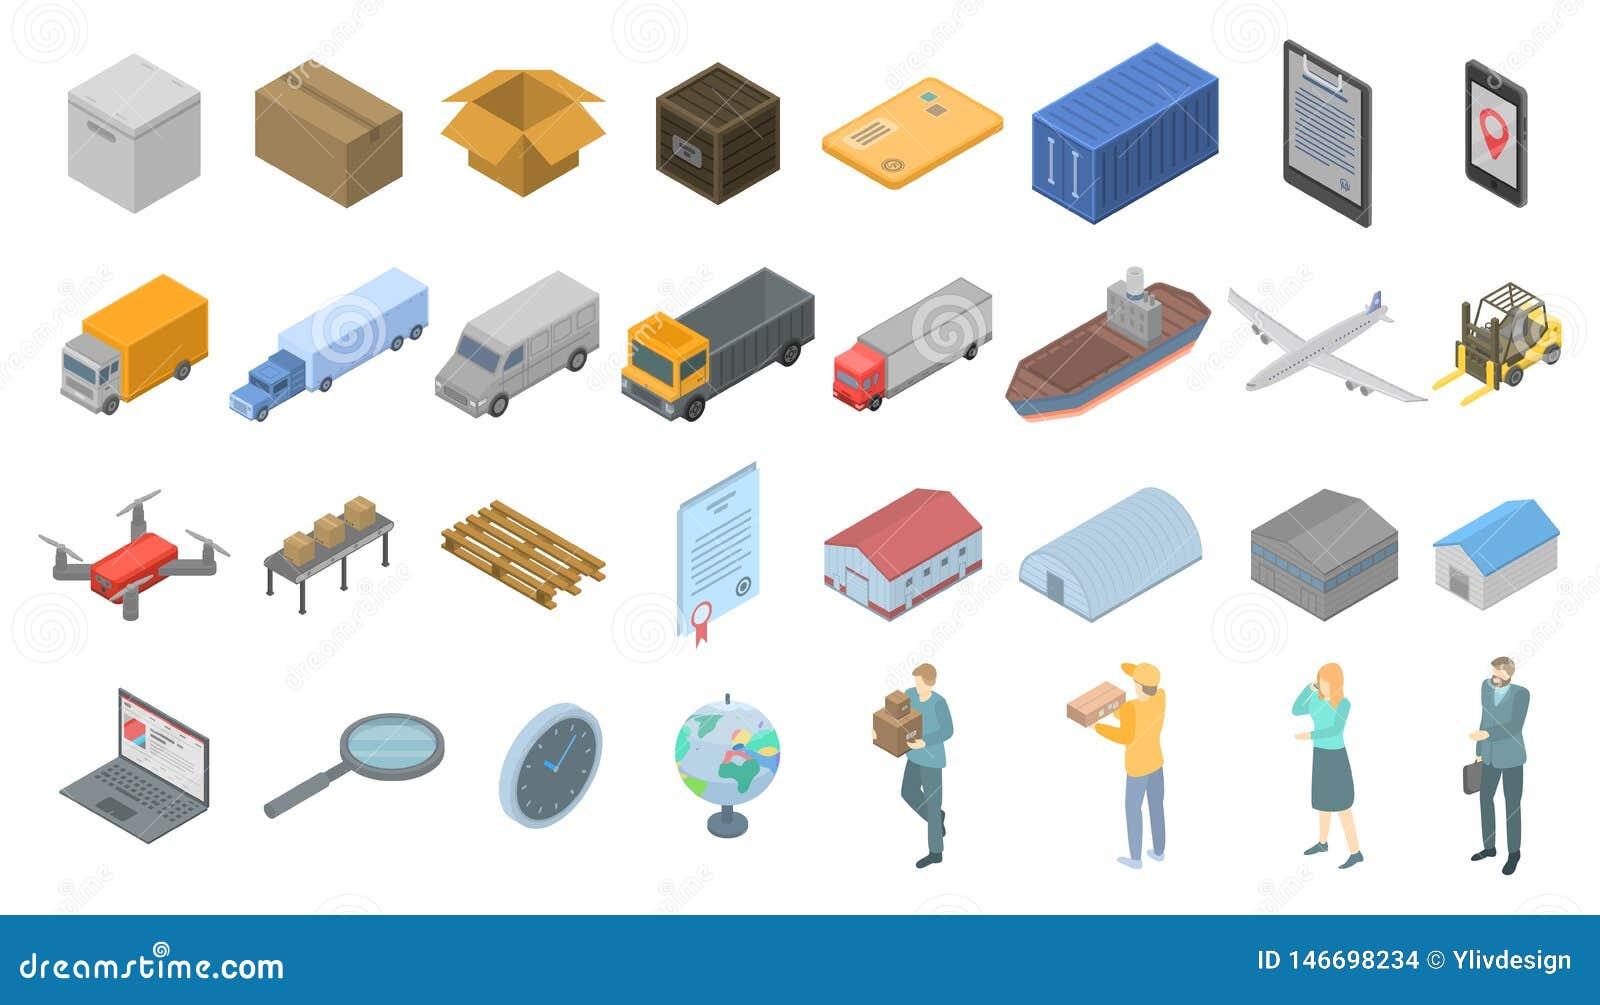 Goods export icons set, isometric style